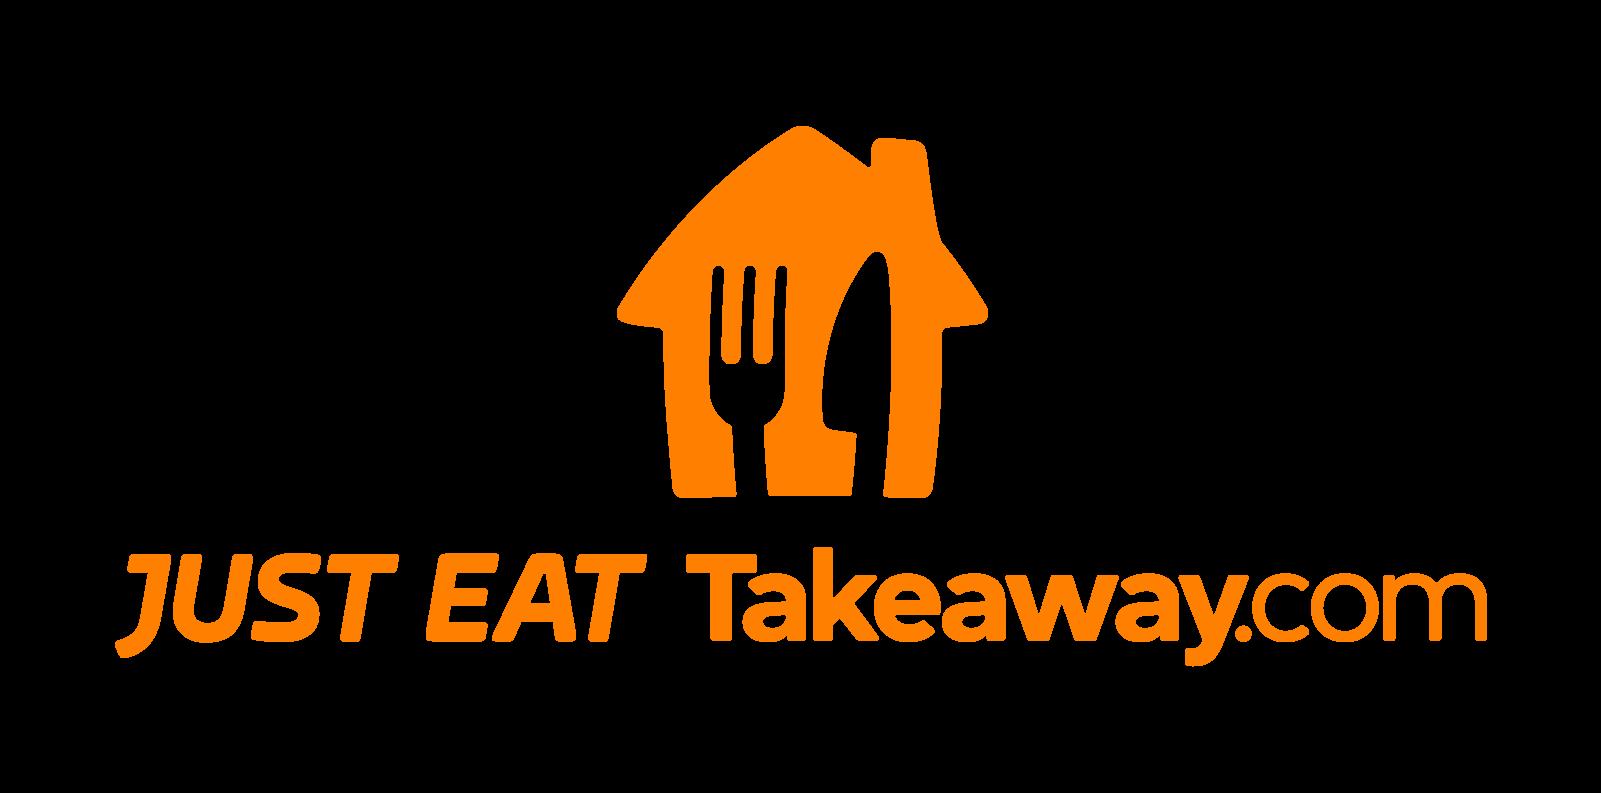 Just Eat Takeaway stock